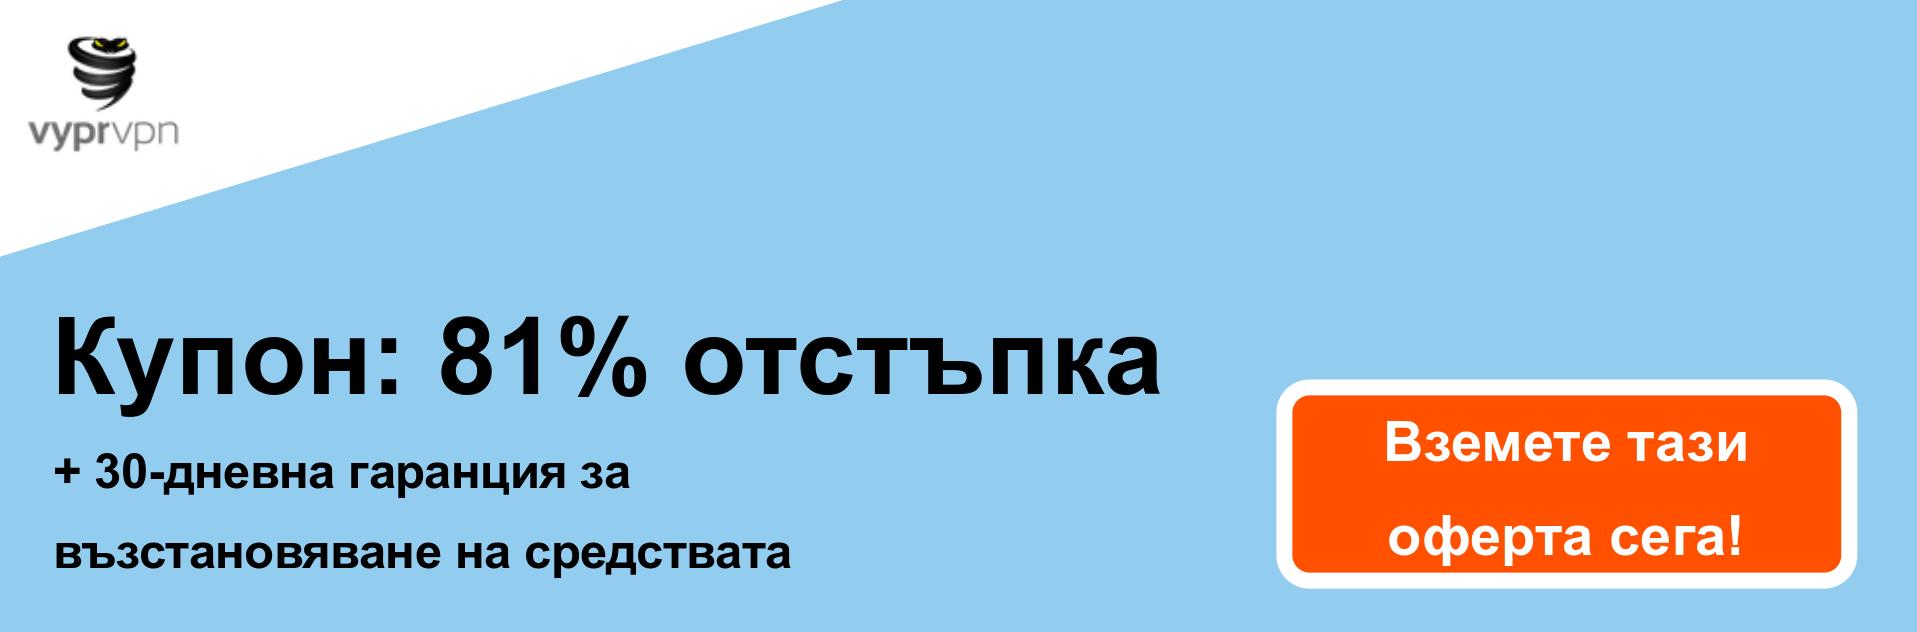 Vypr VPN банер купон - отстъпка 81%